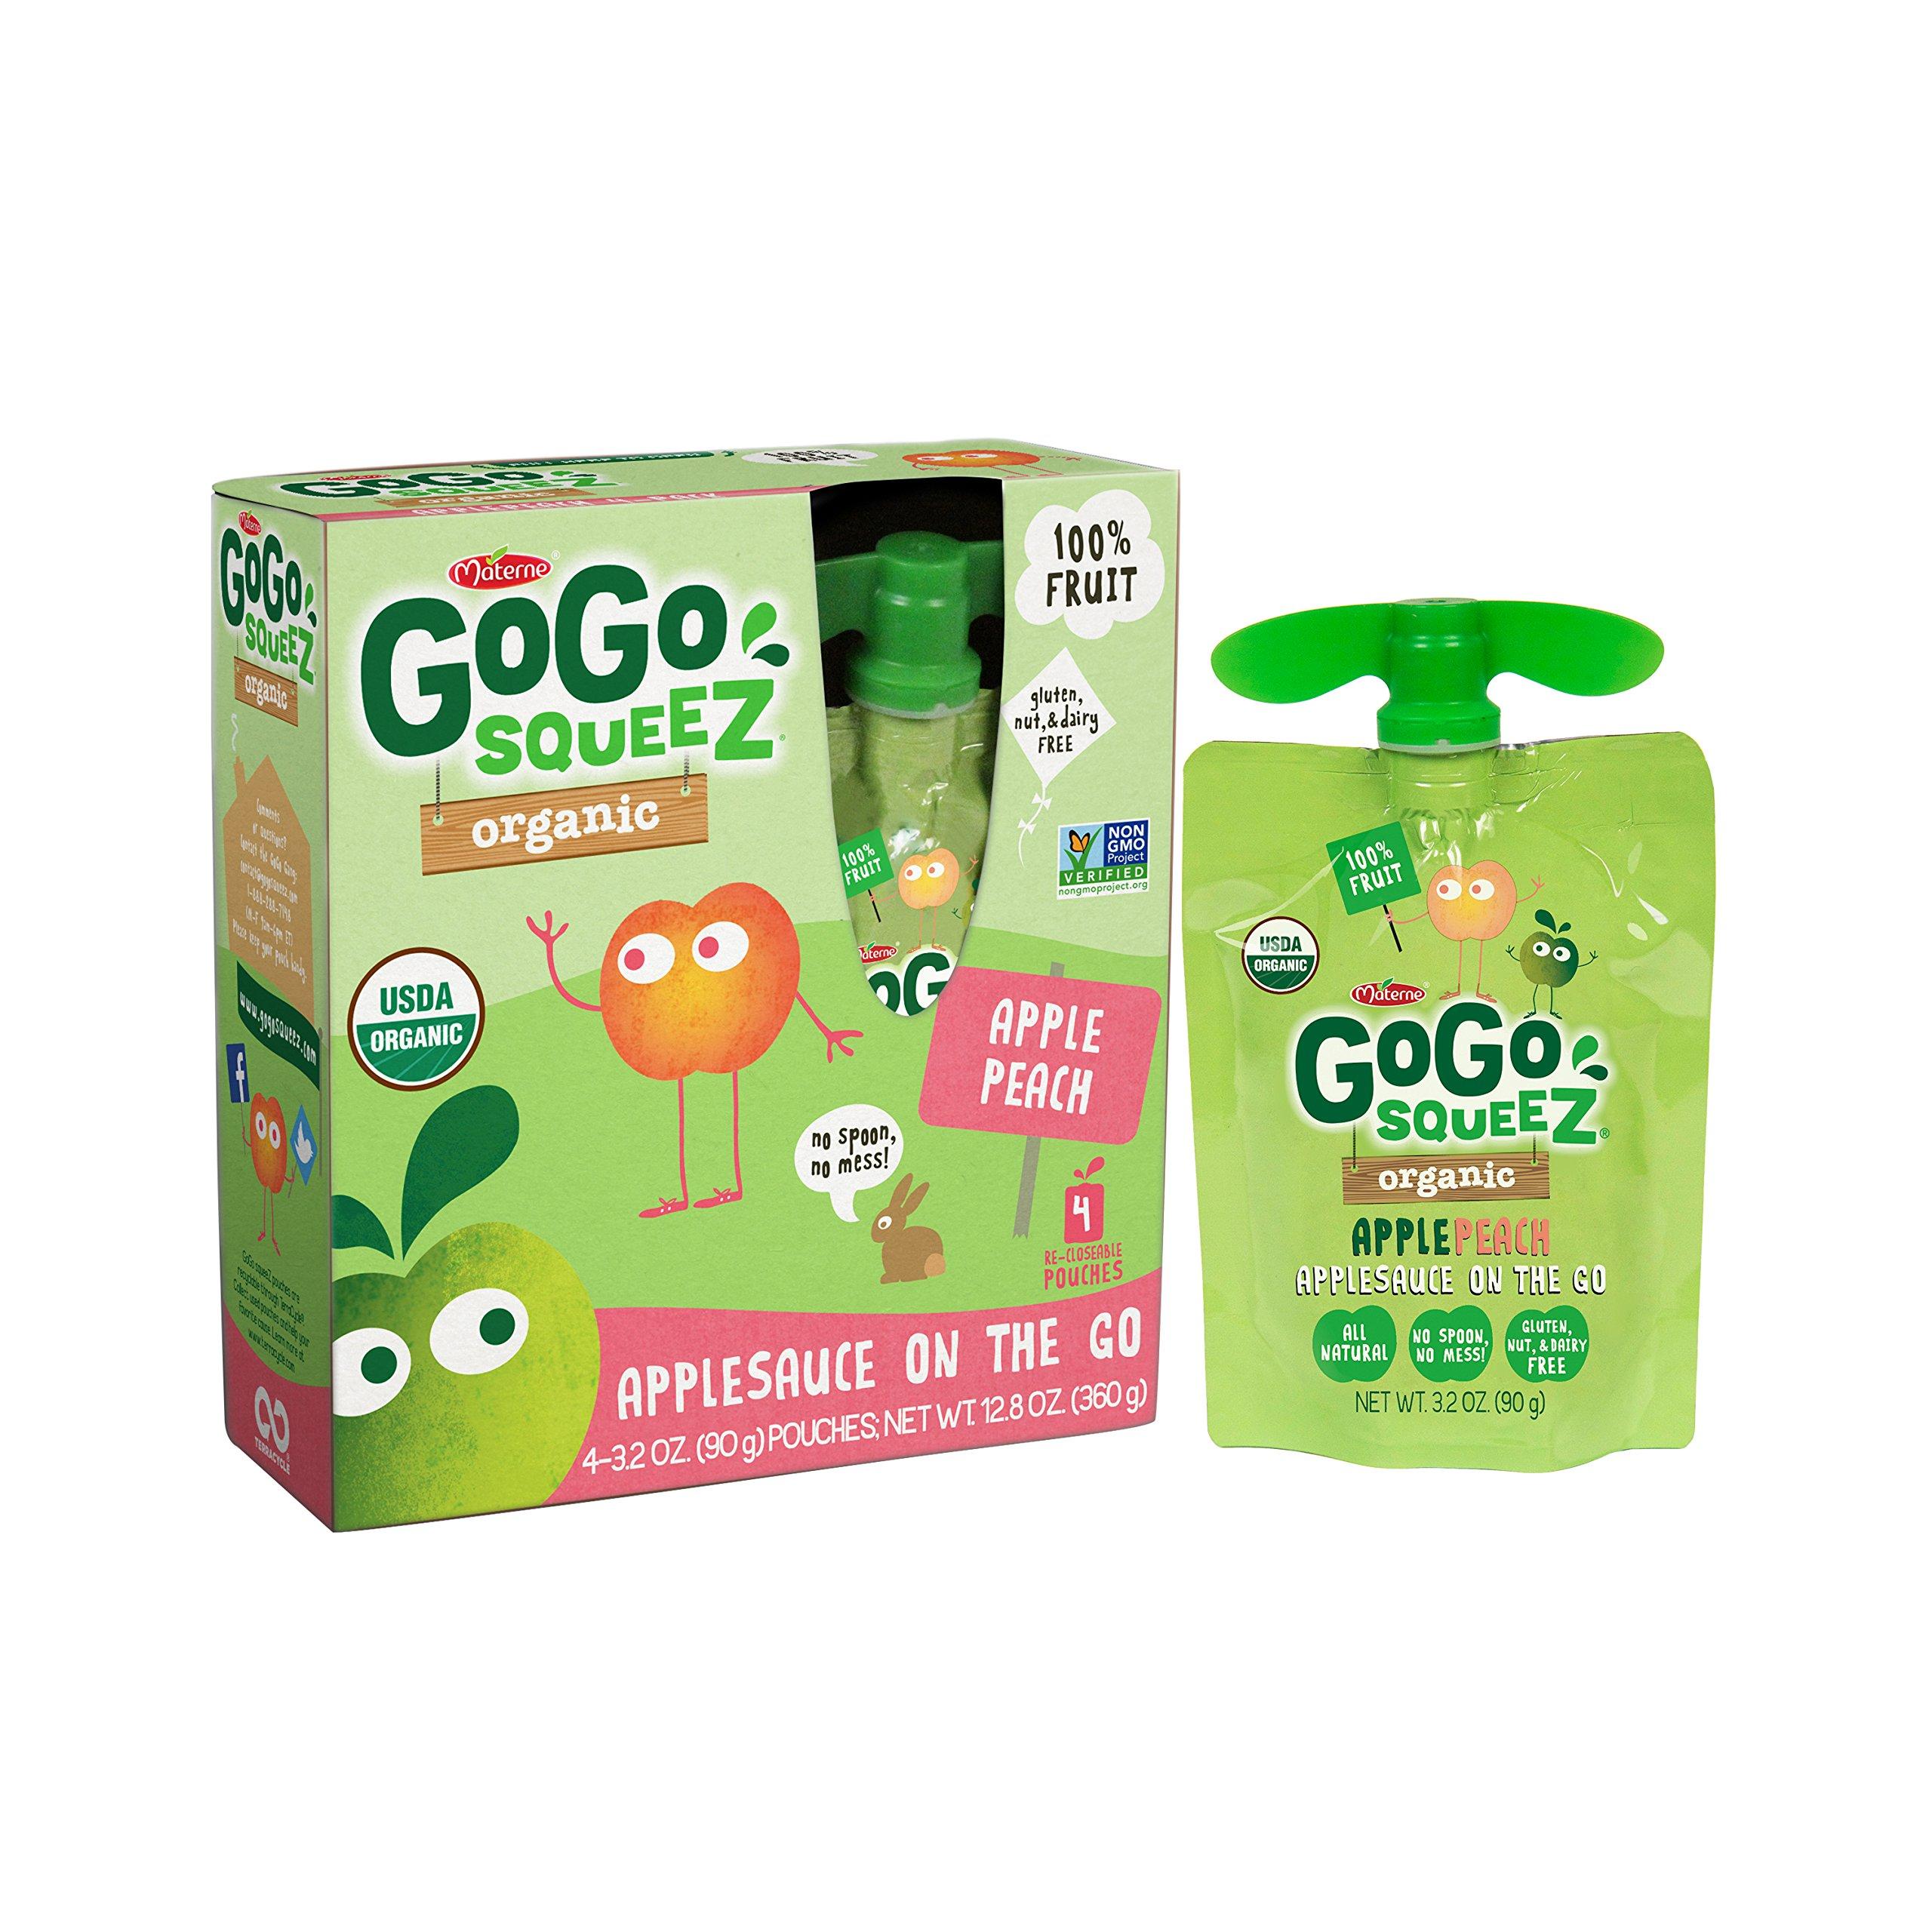 GoGo squeeZ Organic Applesauce on the Go, Apple Peach 3.2-Ounce Portable BPA-Free Pouches, 4 Pouches